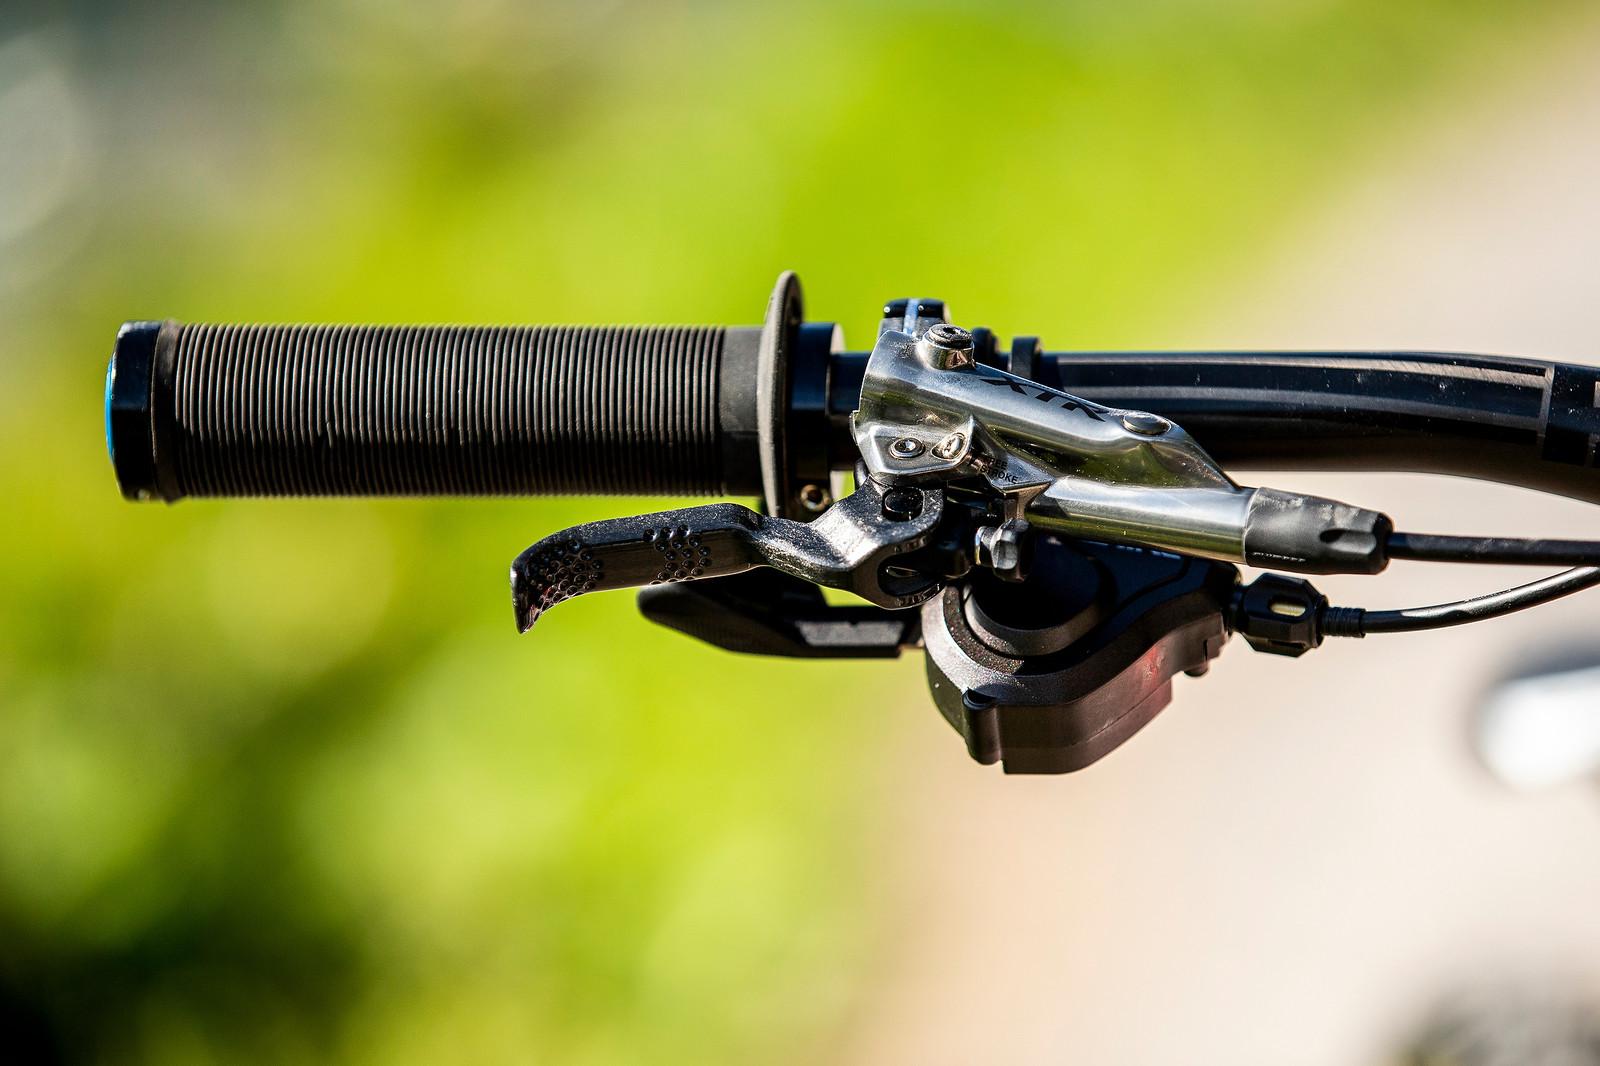 Flanged Grips - WORLD CHAMPS BIKE - Danny Hart's Saracen Myst - Mountain Biking Pictures - Vital MTB